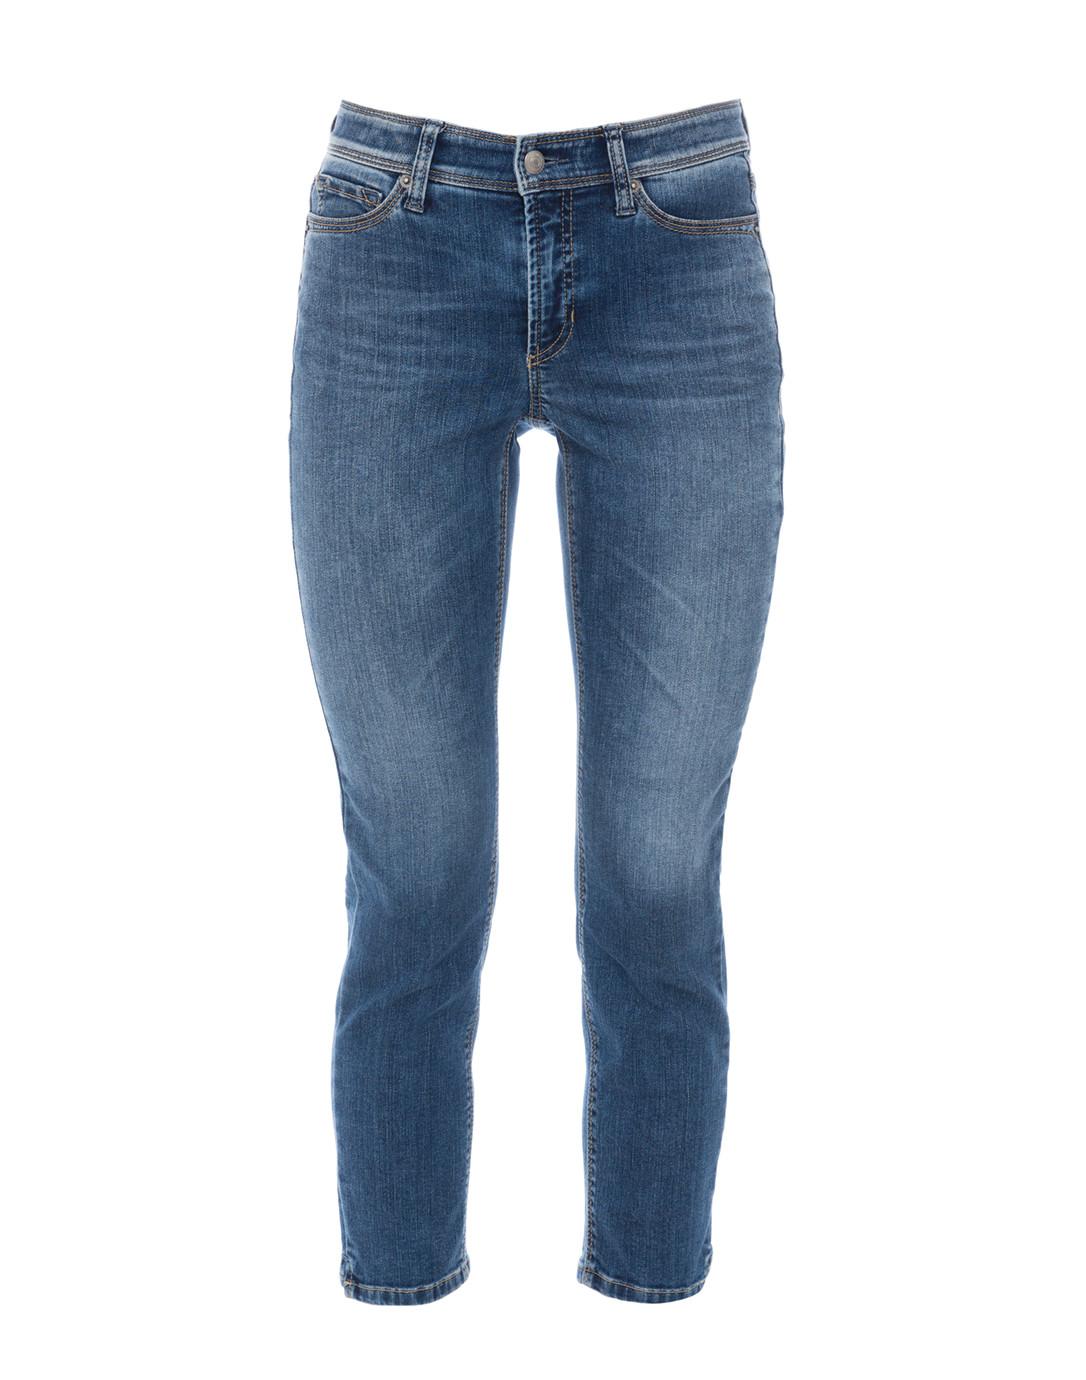 Wardrobe Cornerstones – Jeans